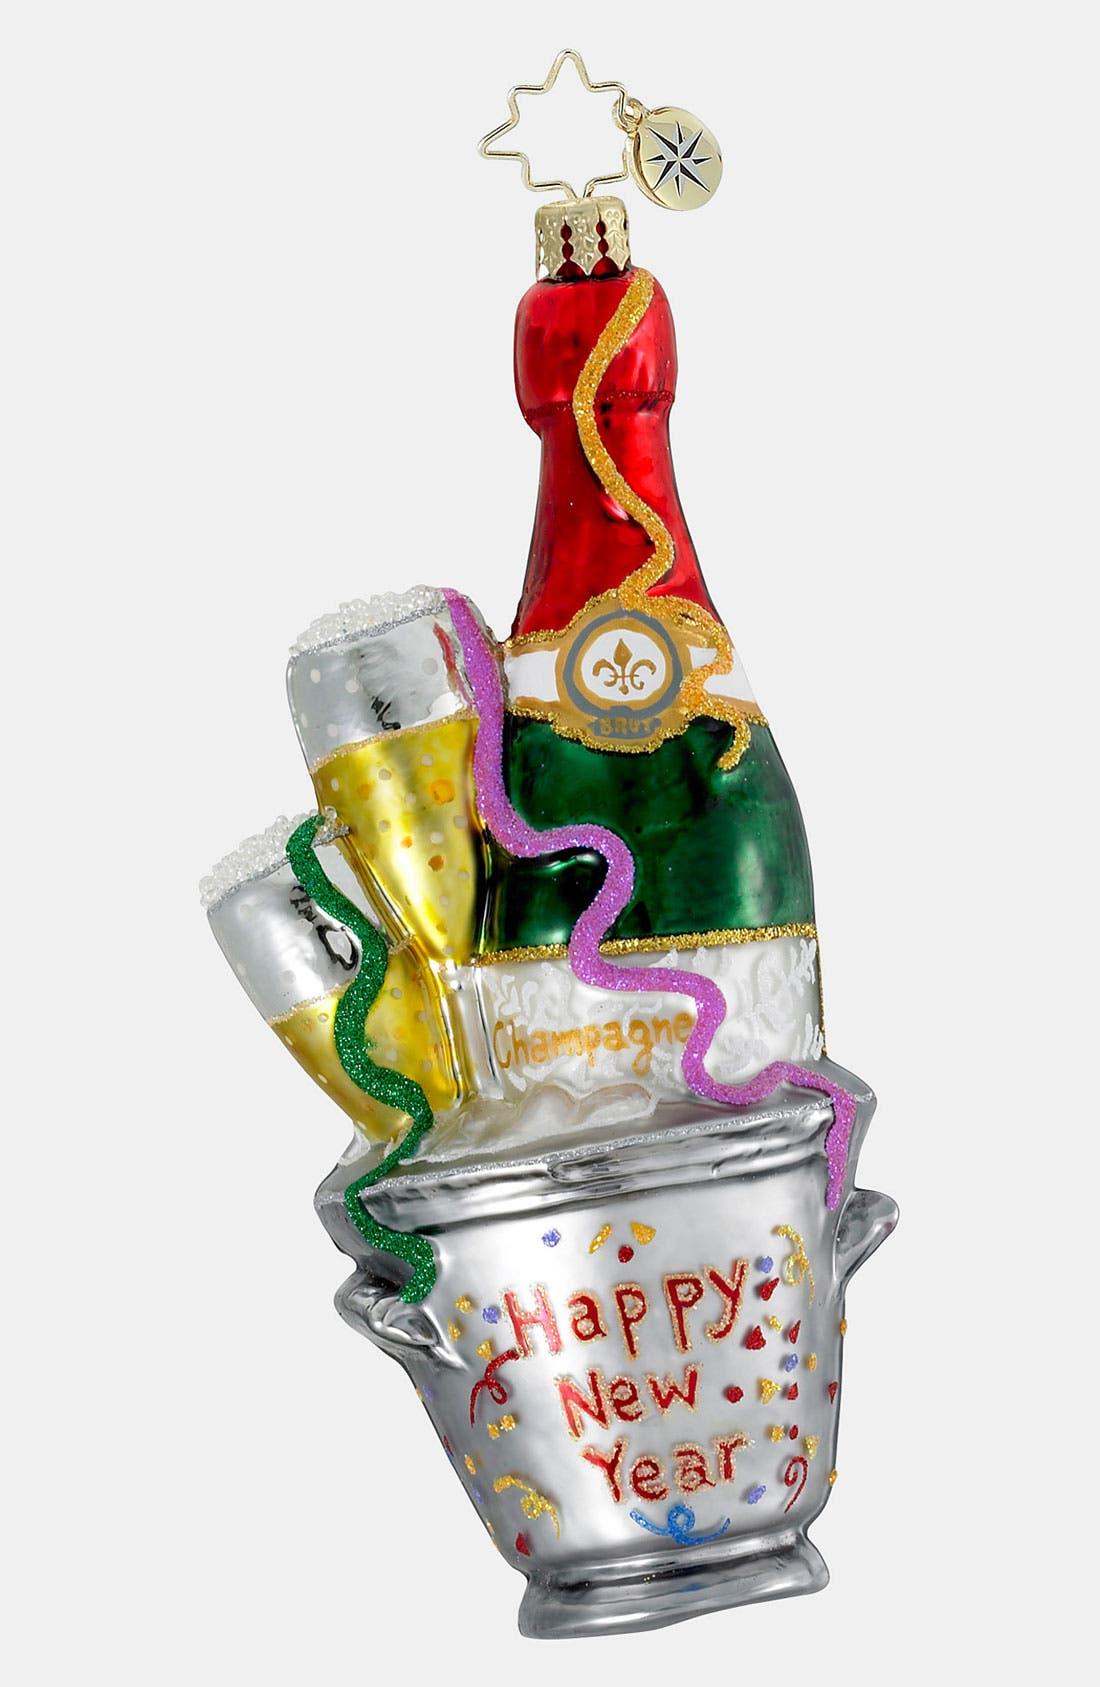 Main Image - Christopher Radko 'Champagne Wishes' Ornament